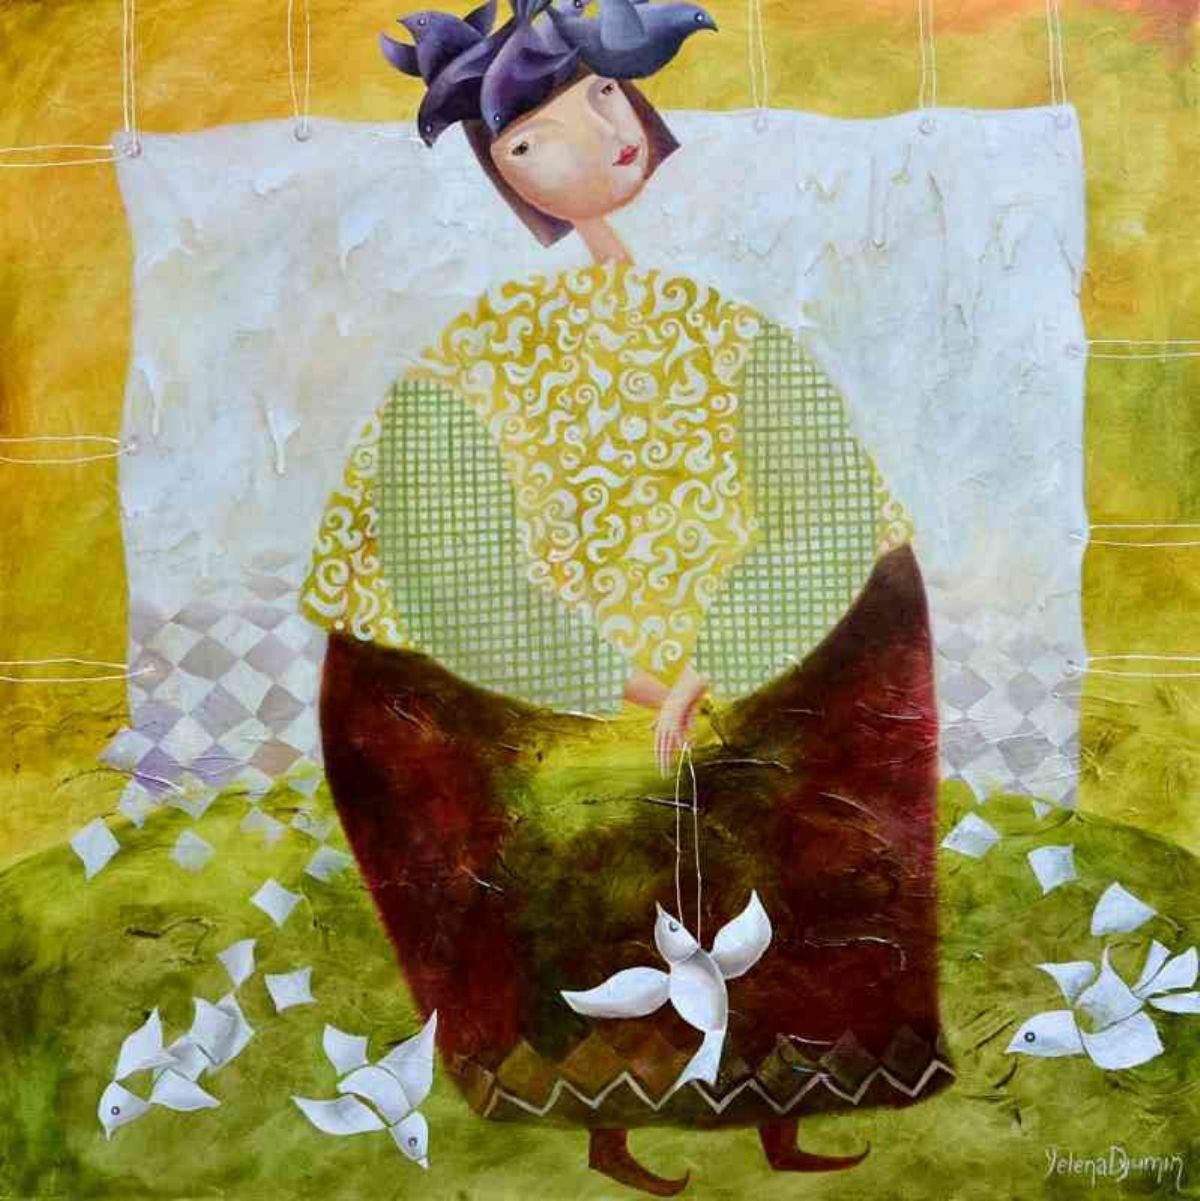 Paper pigeons Artwork By Yelena Dyumin - Buy Art on Artplode